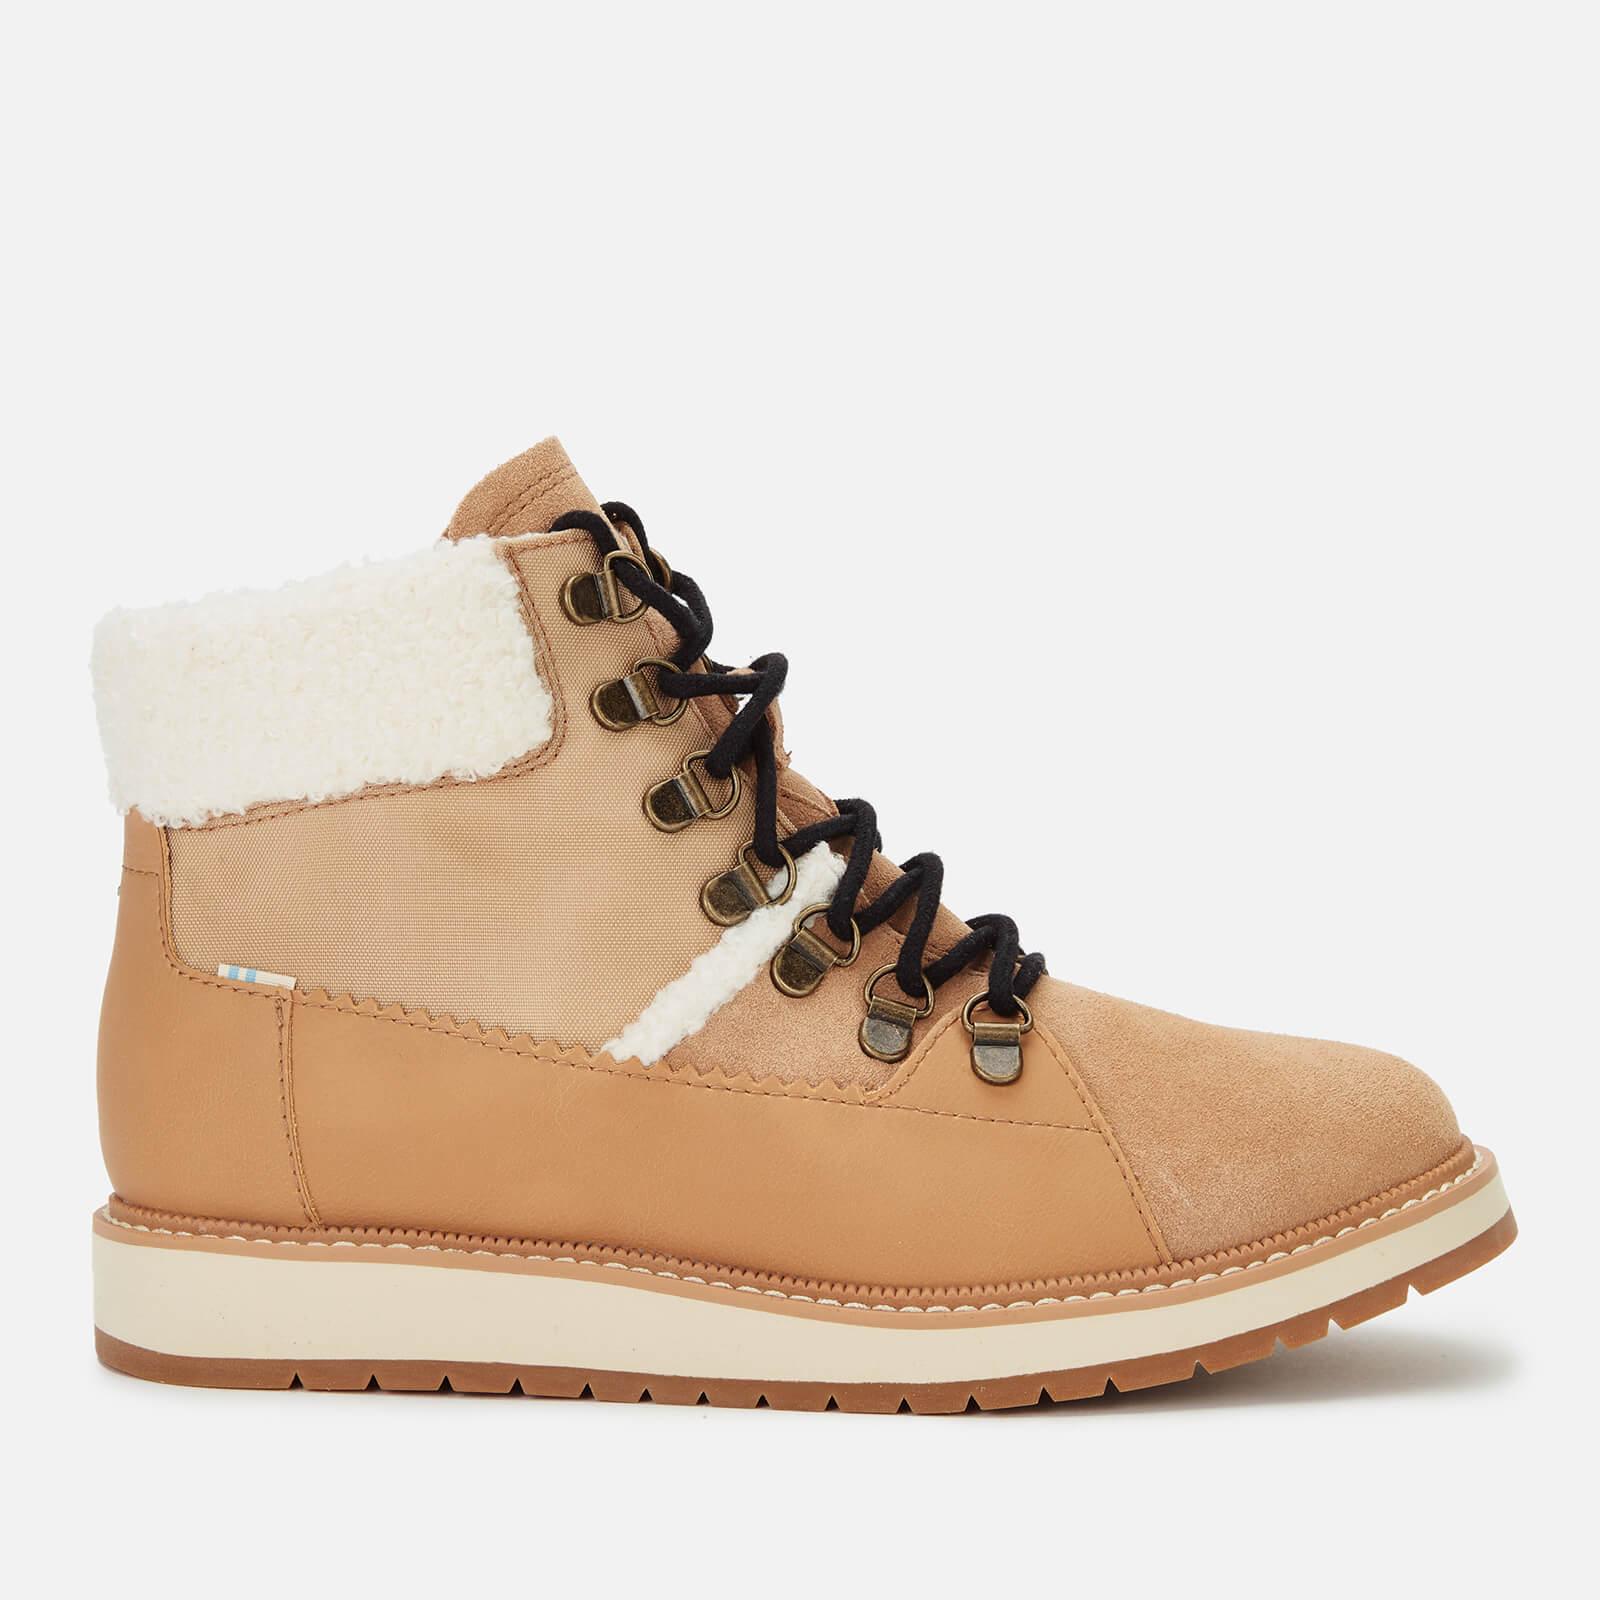 TOMS Women's Mesa Hiking Style Boots - Tan - UK 7